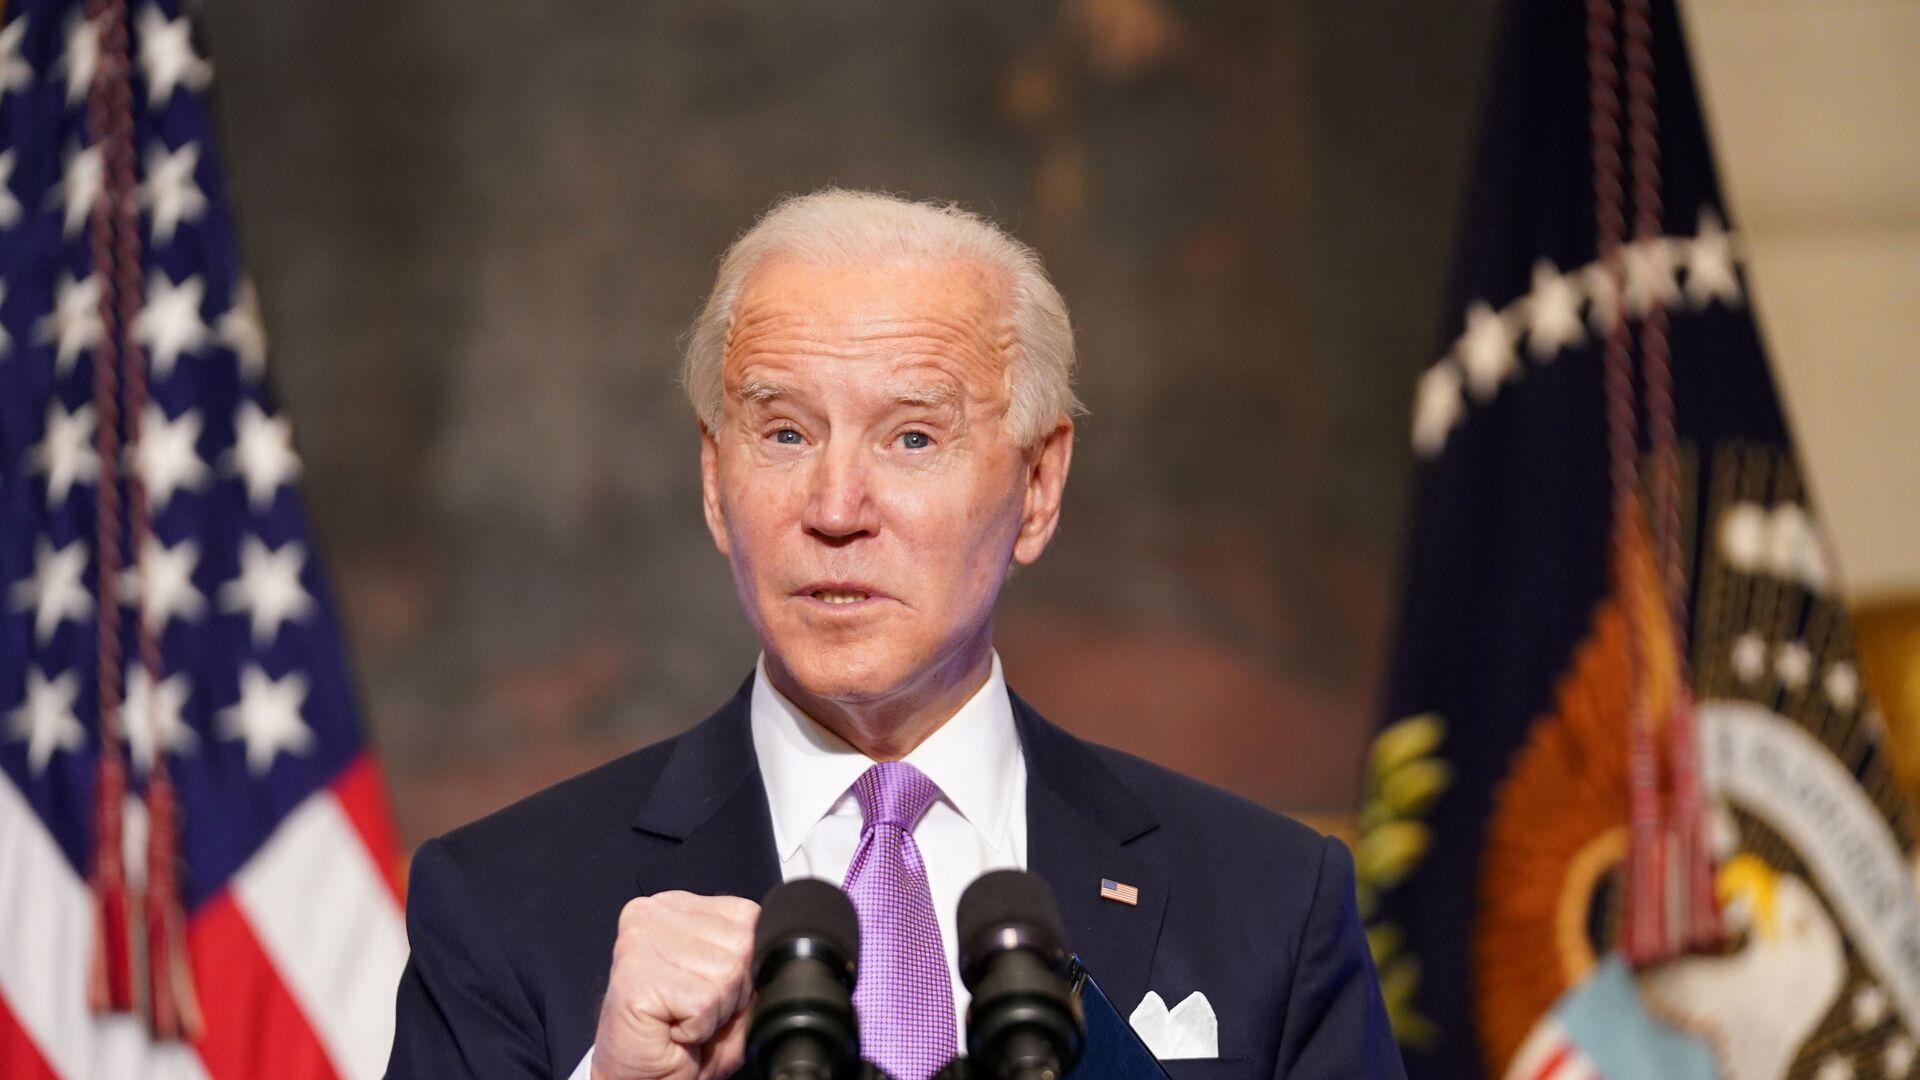 Joe Biden, presidente de EEUU - Sputnik Mundo, 1920, 21.02.2021